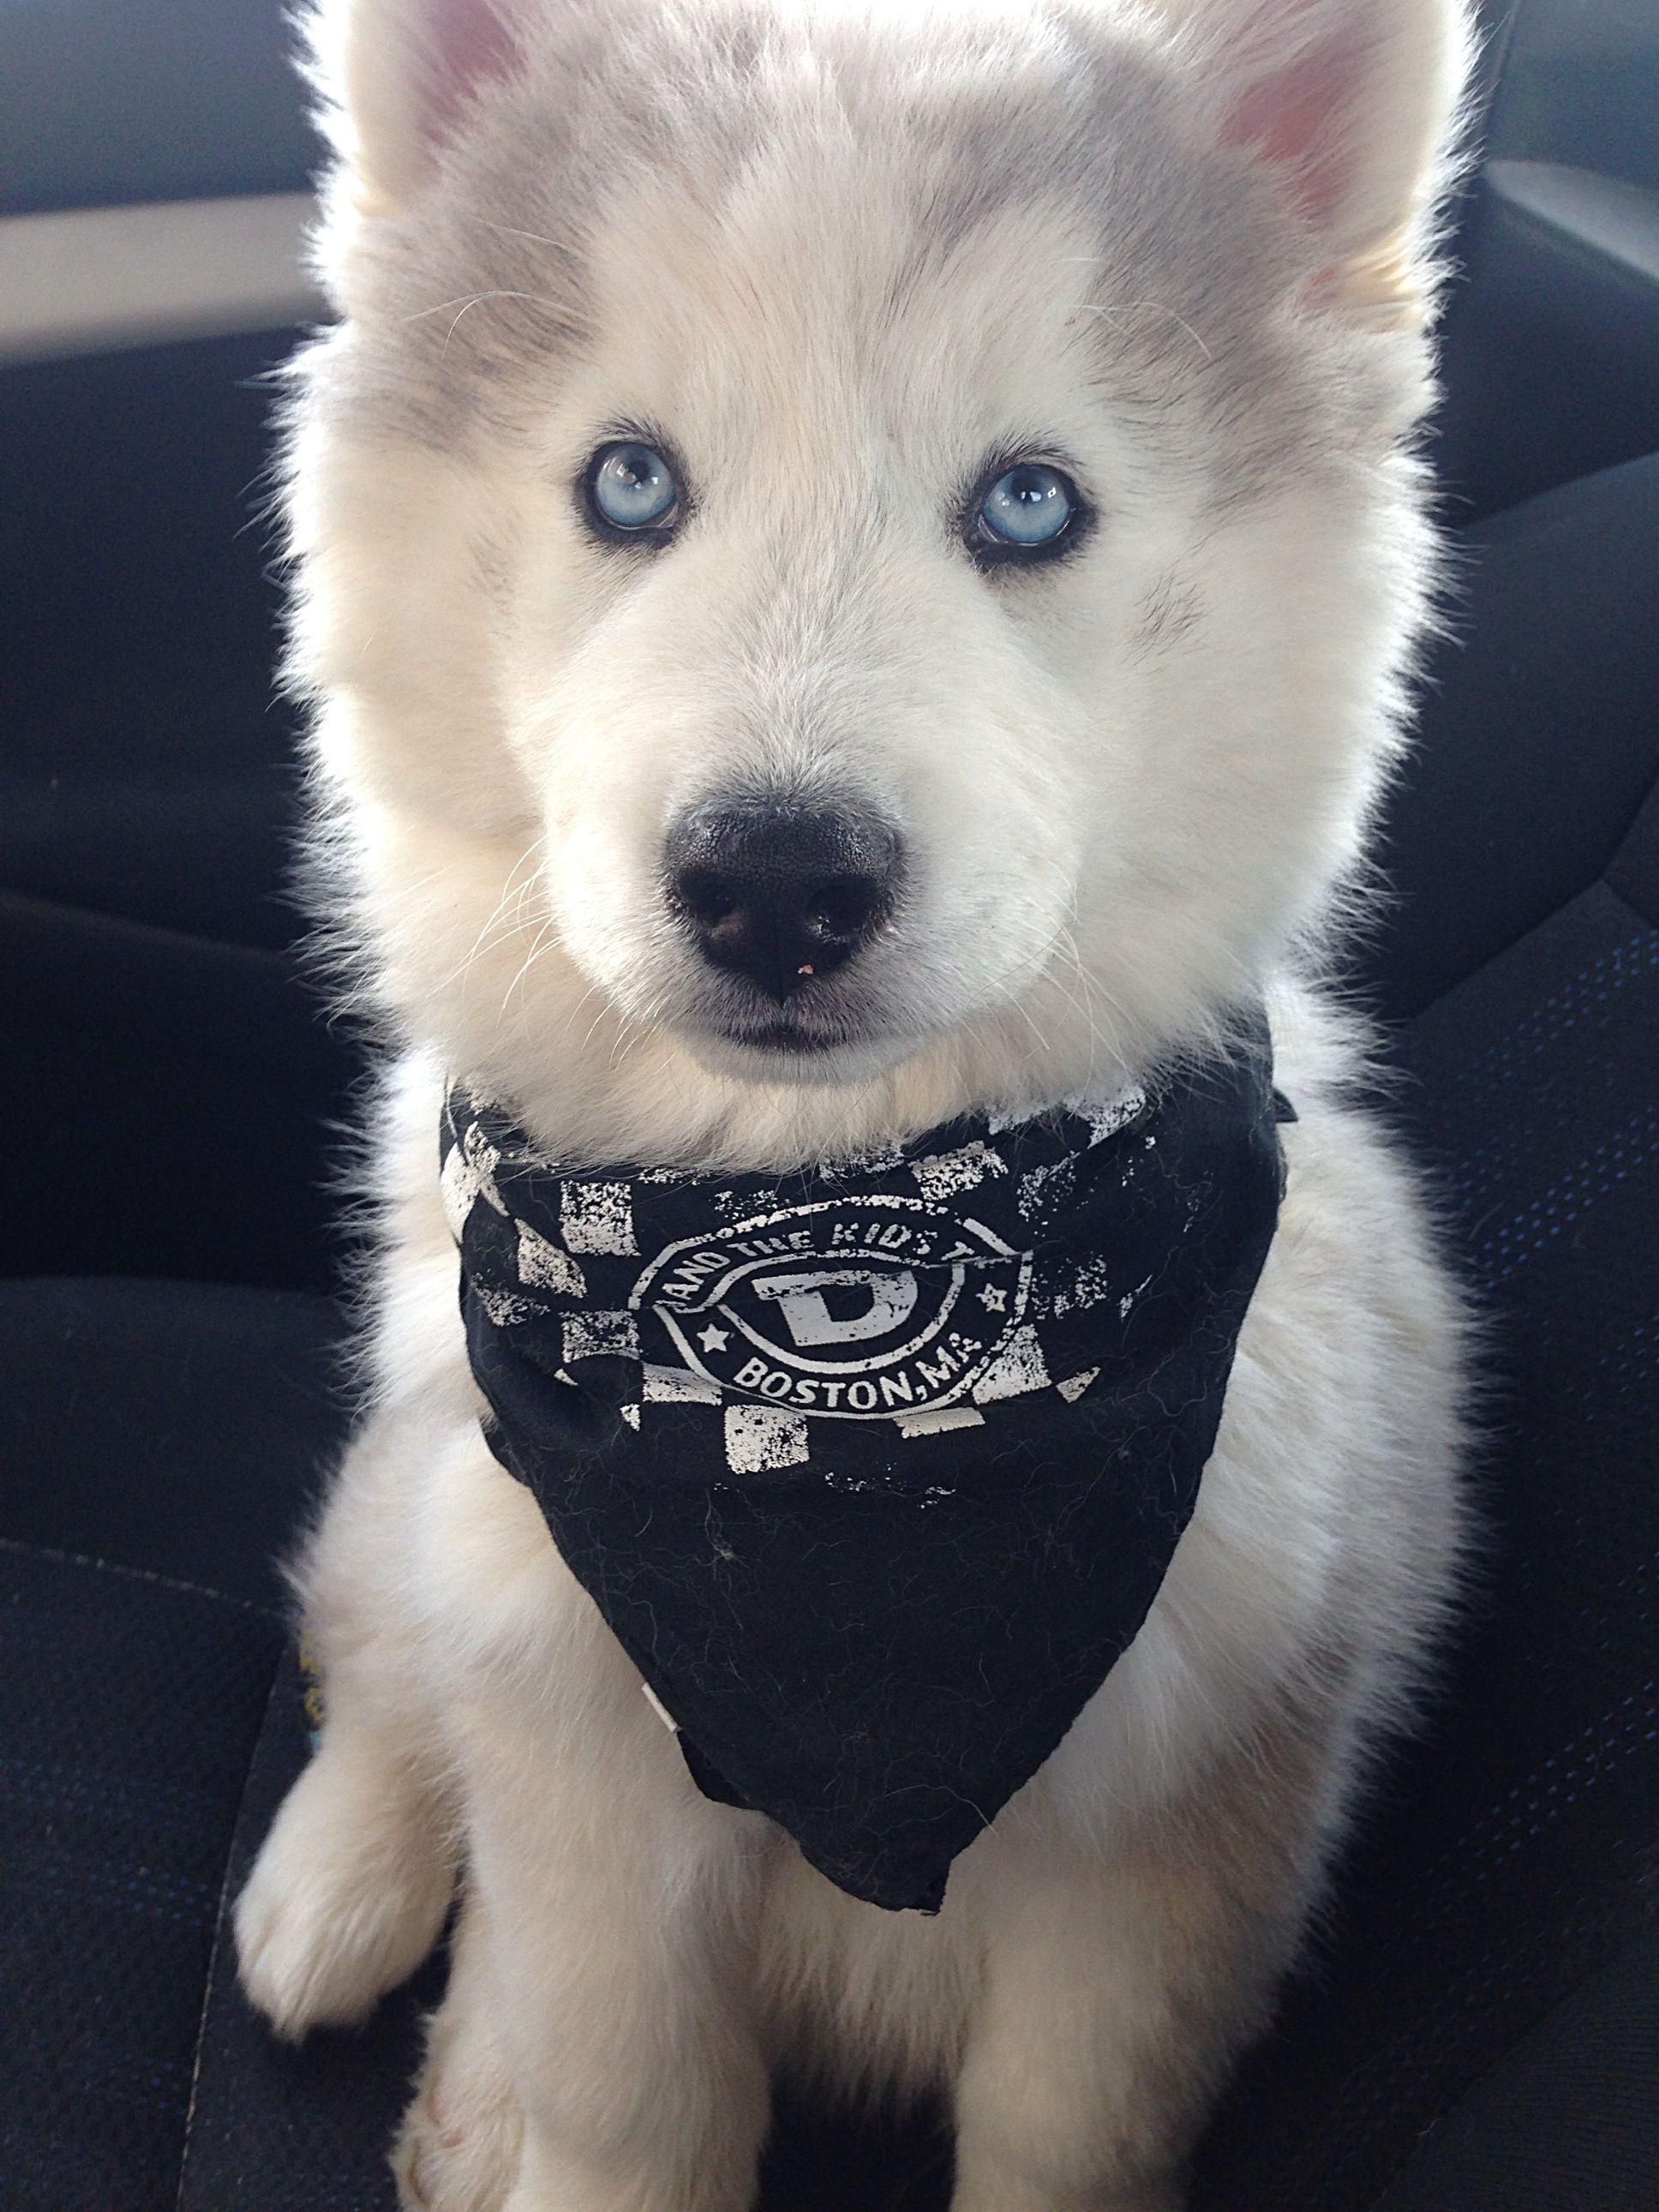 Wooly Husky Puppy Our Beautiful Wooly Husky Puppy Obi Wan Kenobi